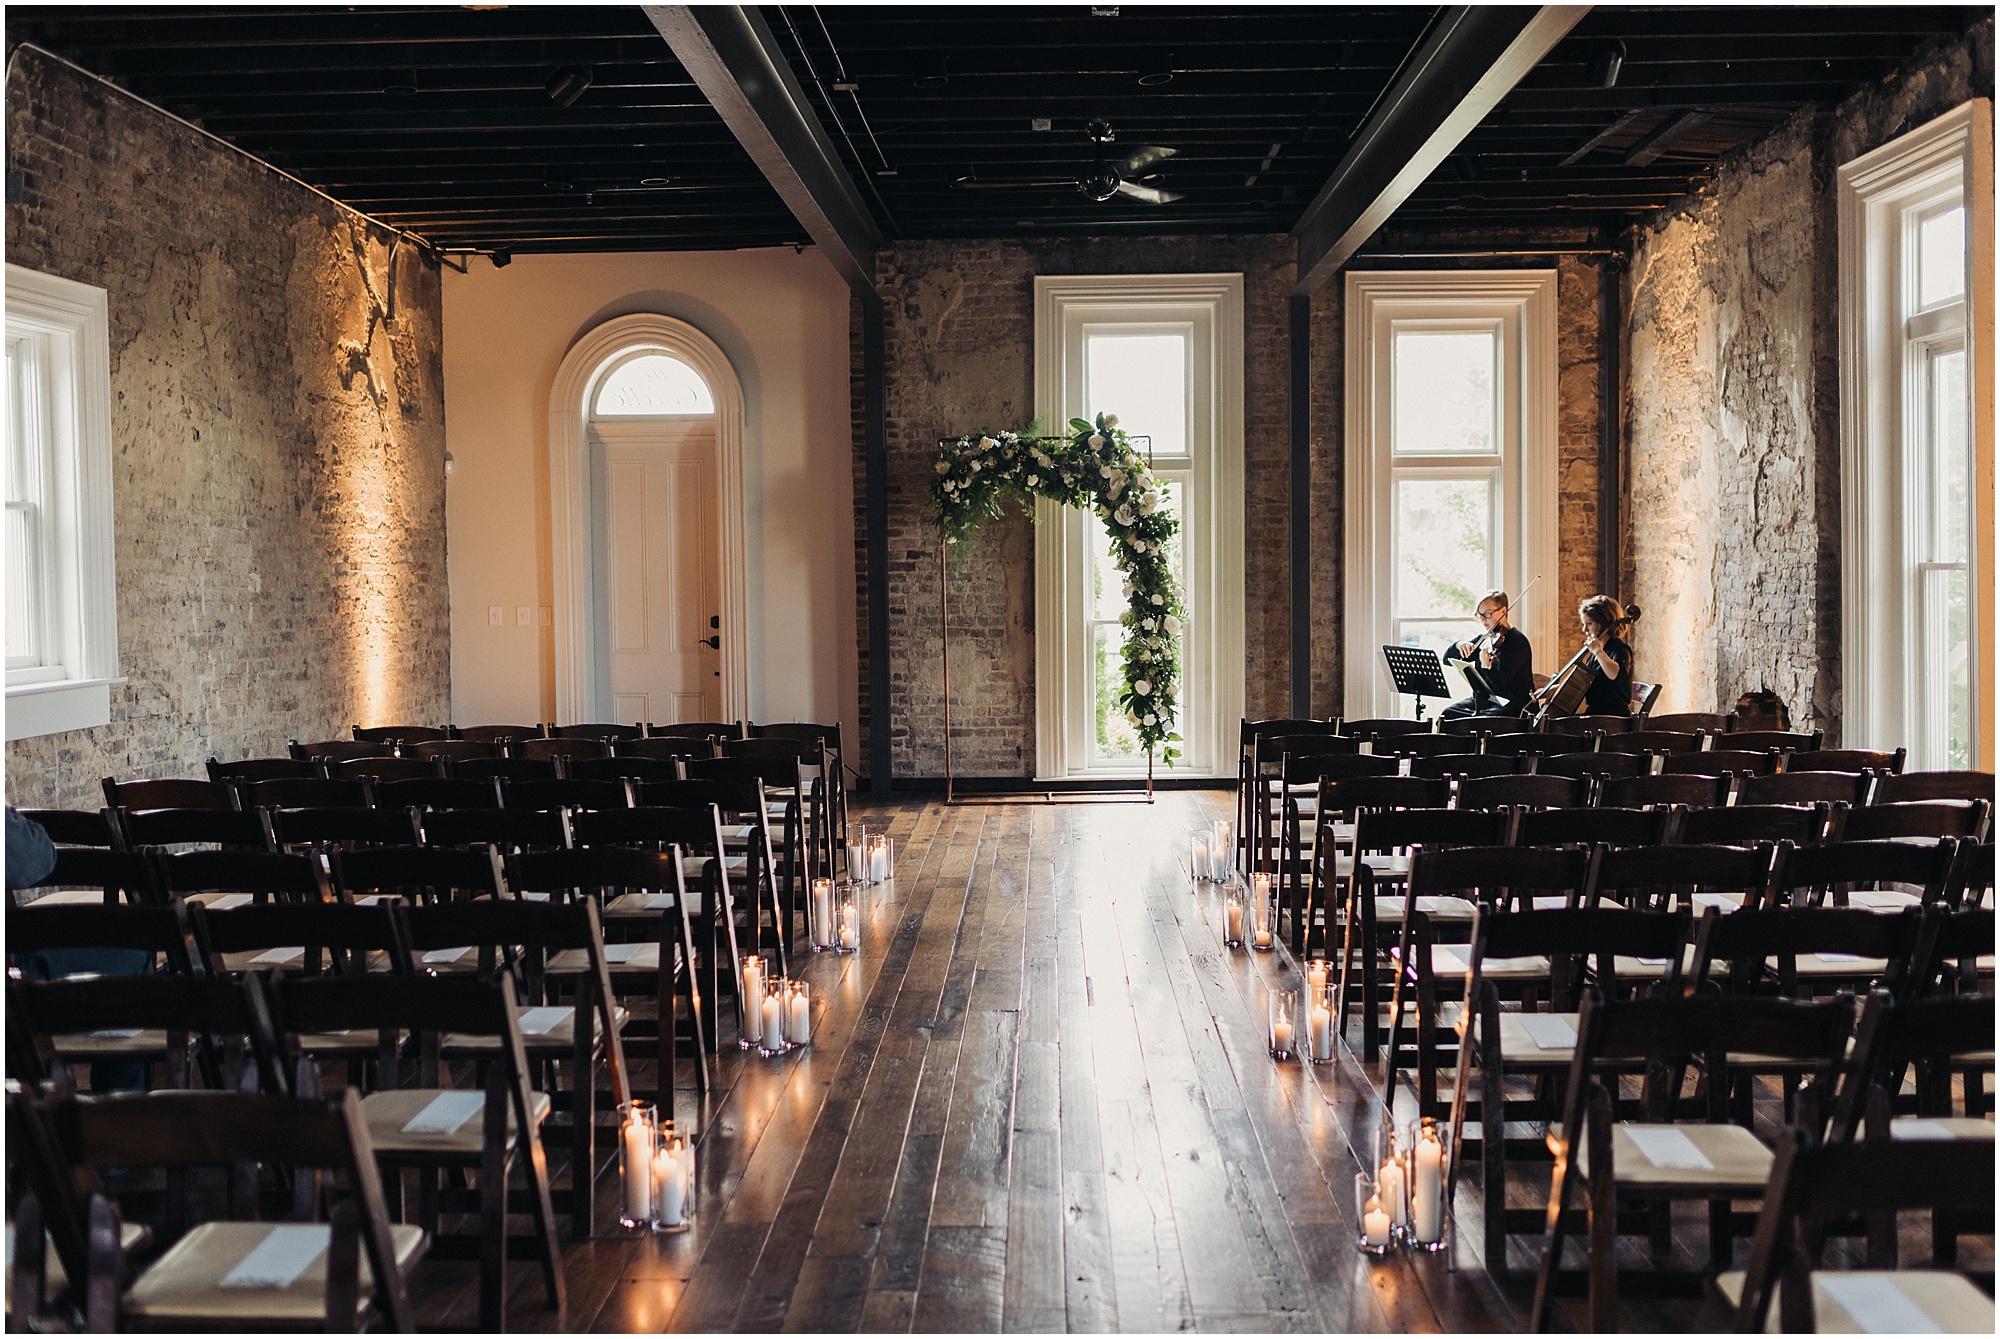 The Cordelle wedding chapel